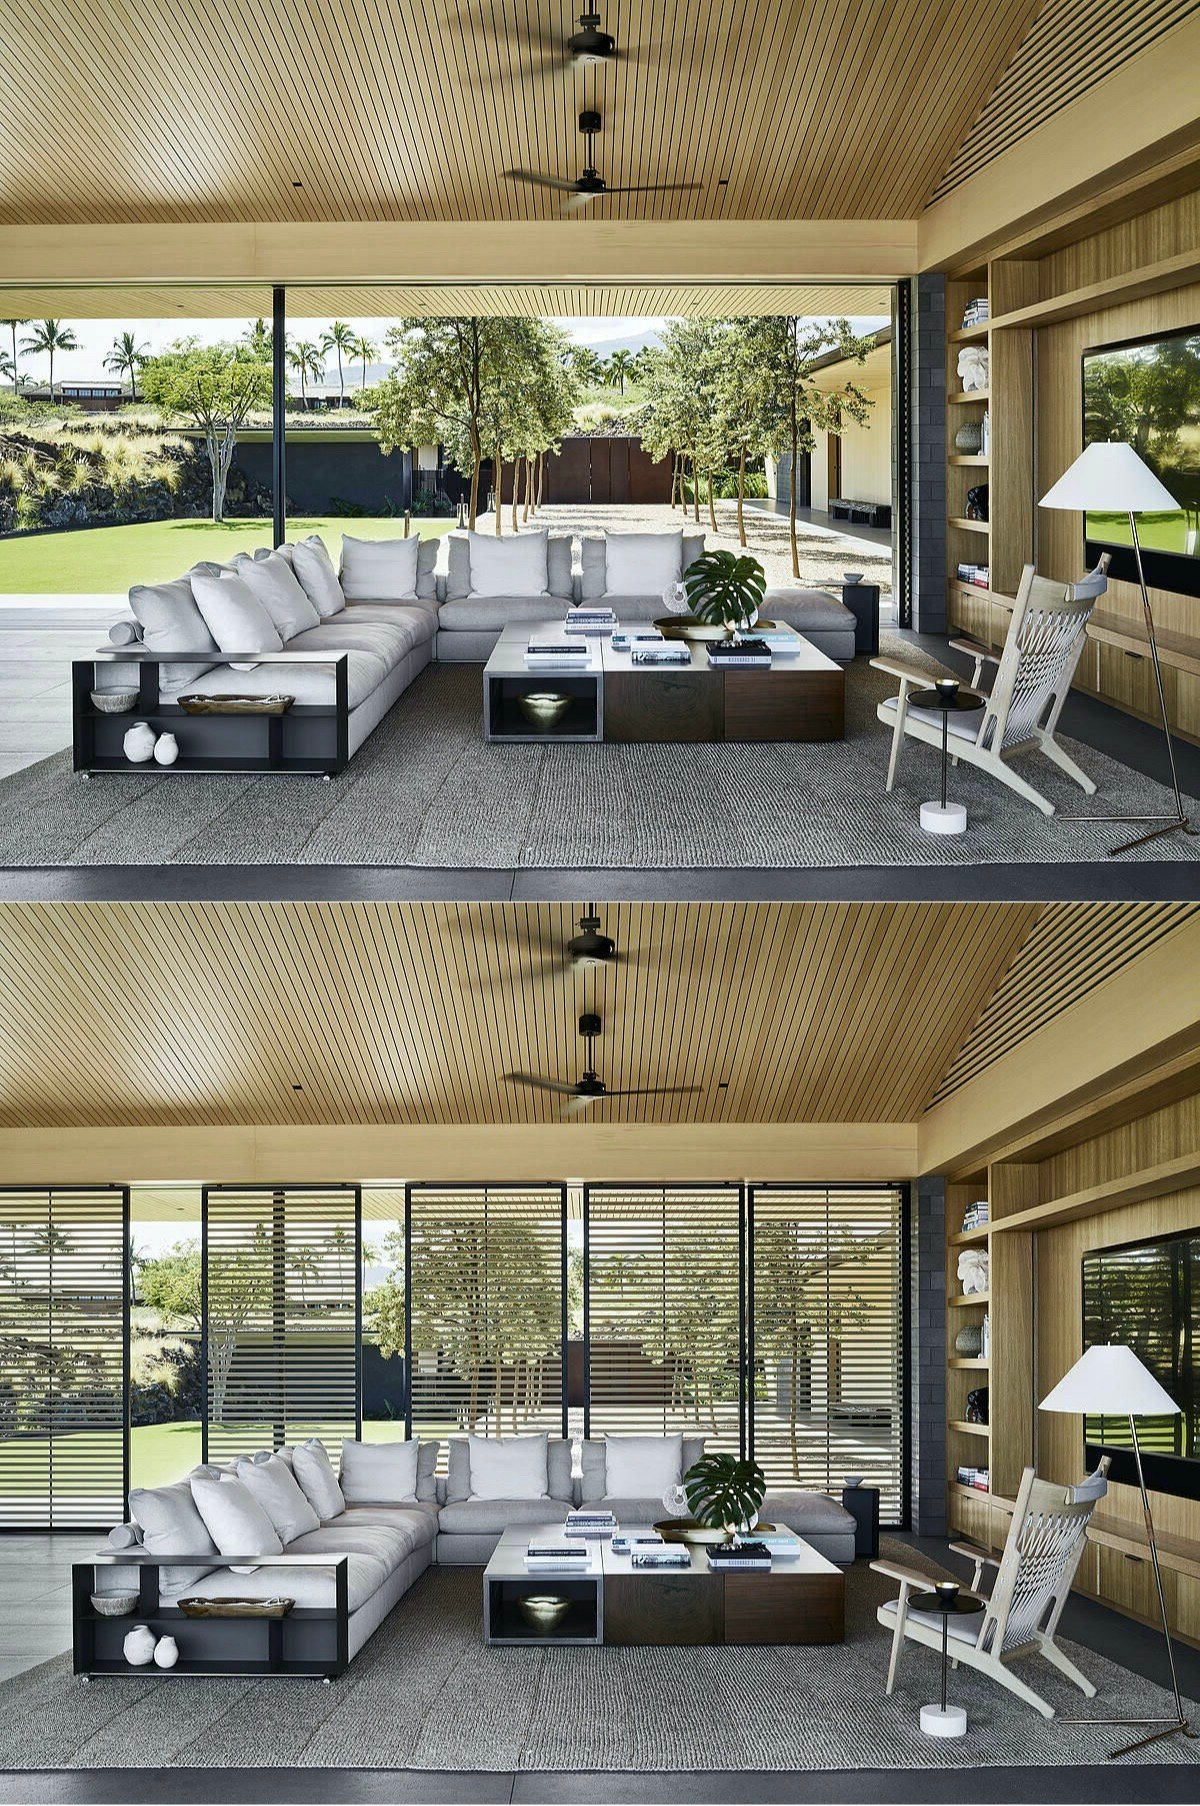 salon panneau bois cèdre meuble acajou moderne